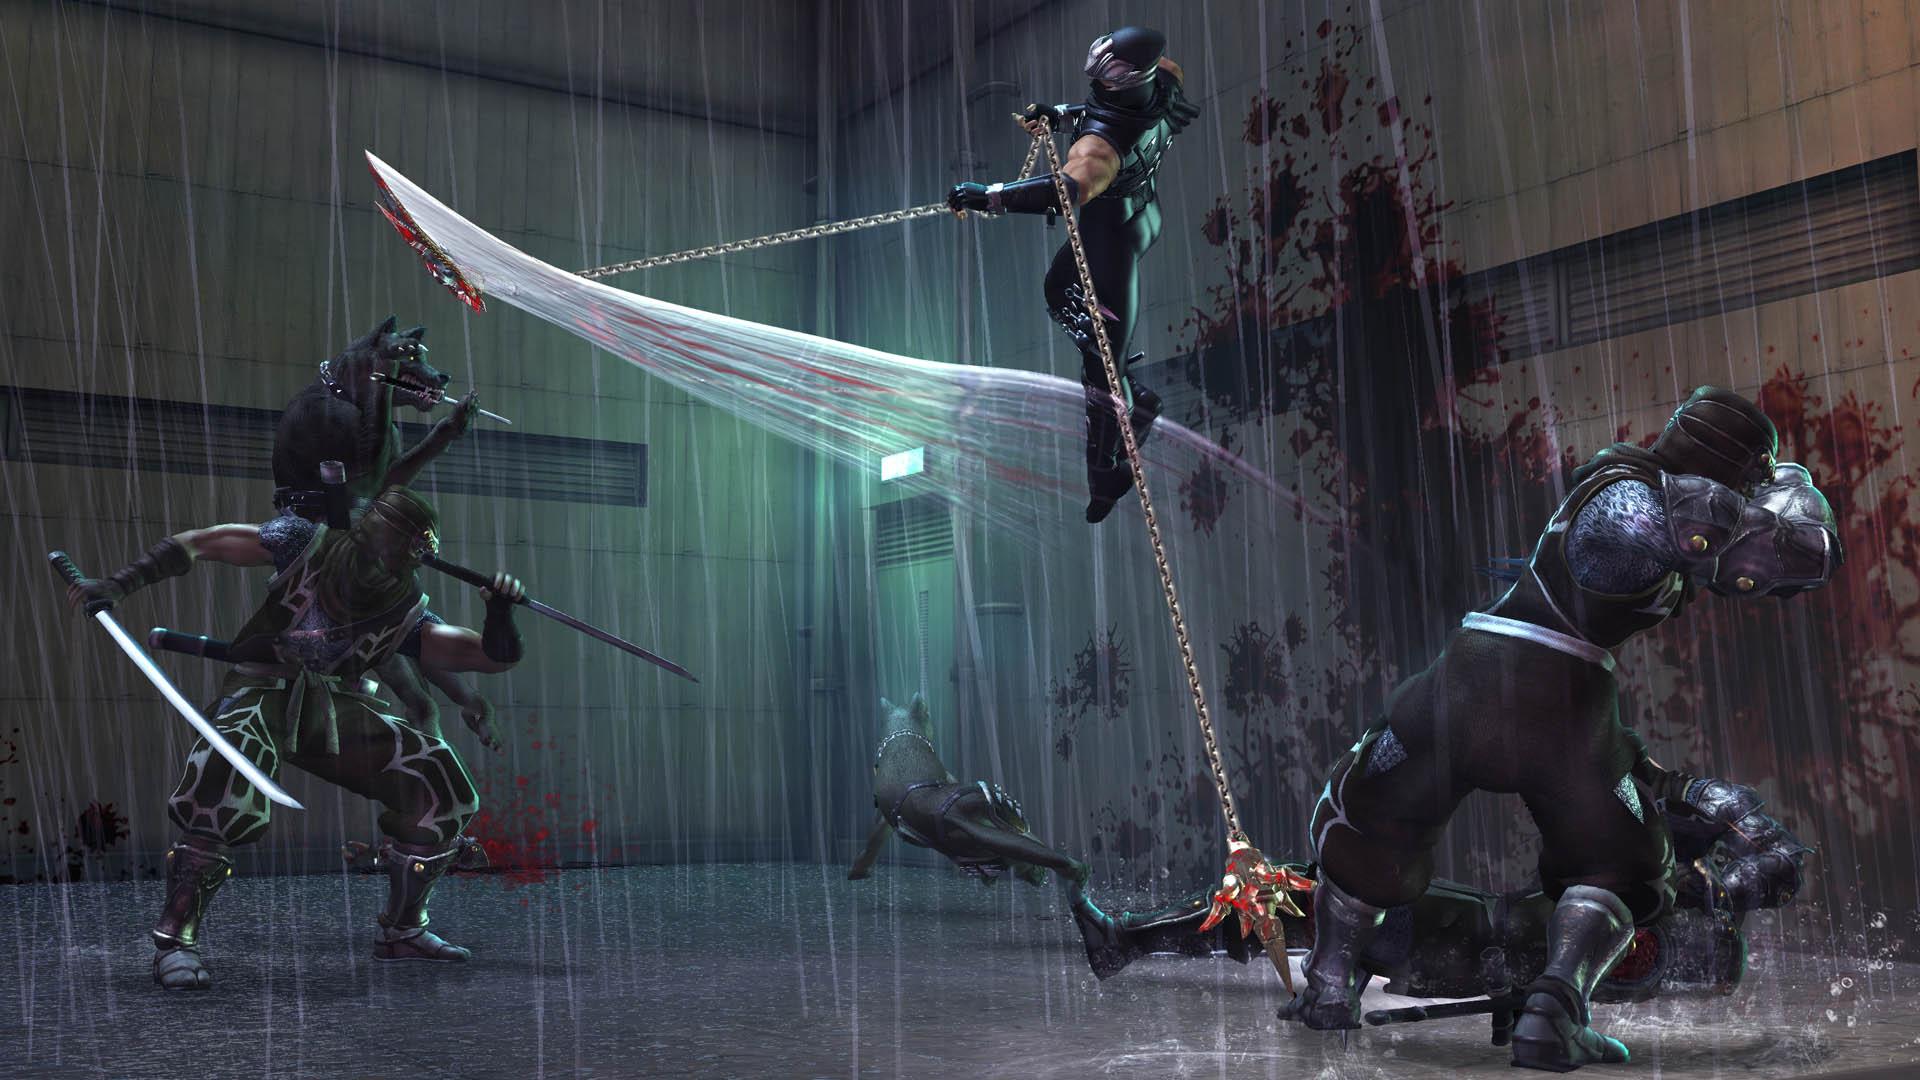 Ninja Gaiden Fantasy Anime Warrior Weapon Sword Battle Chain F Wallpaper 1920x1080 212502